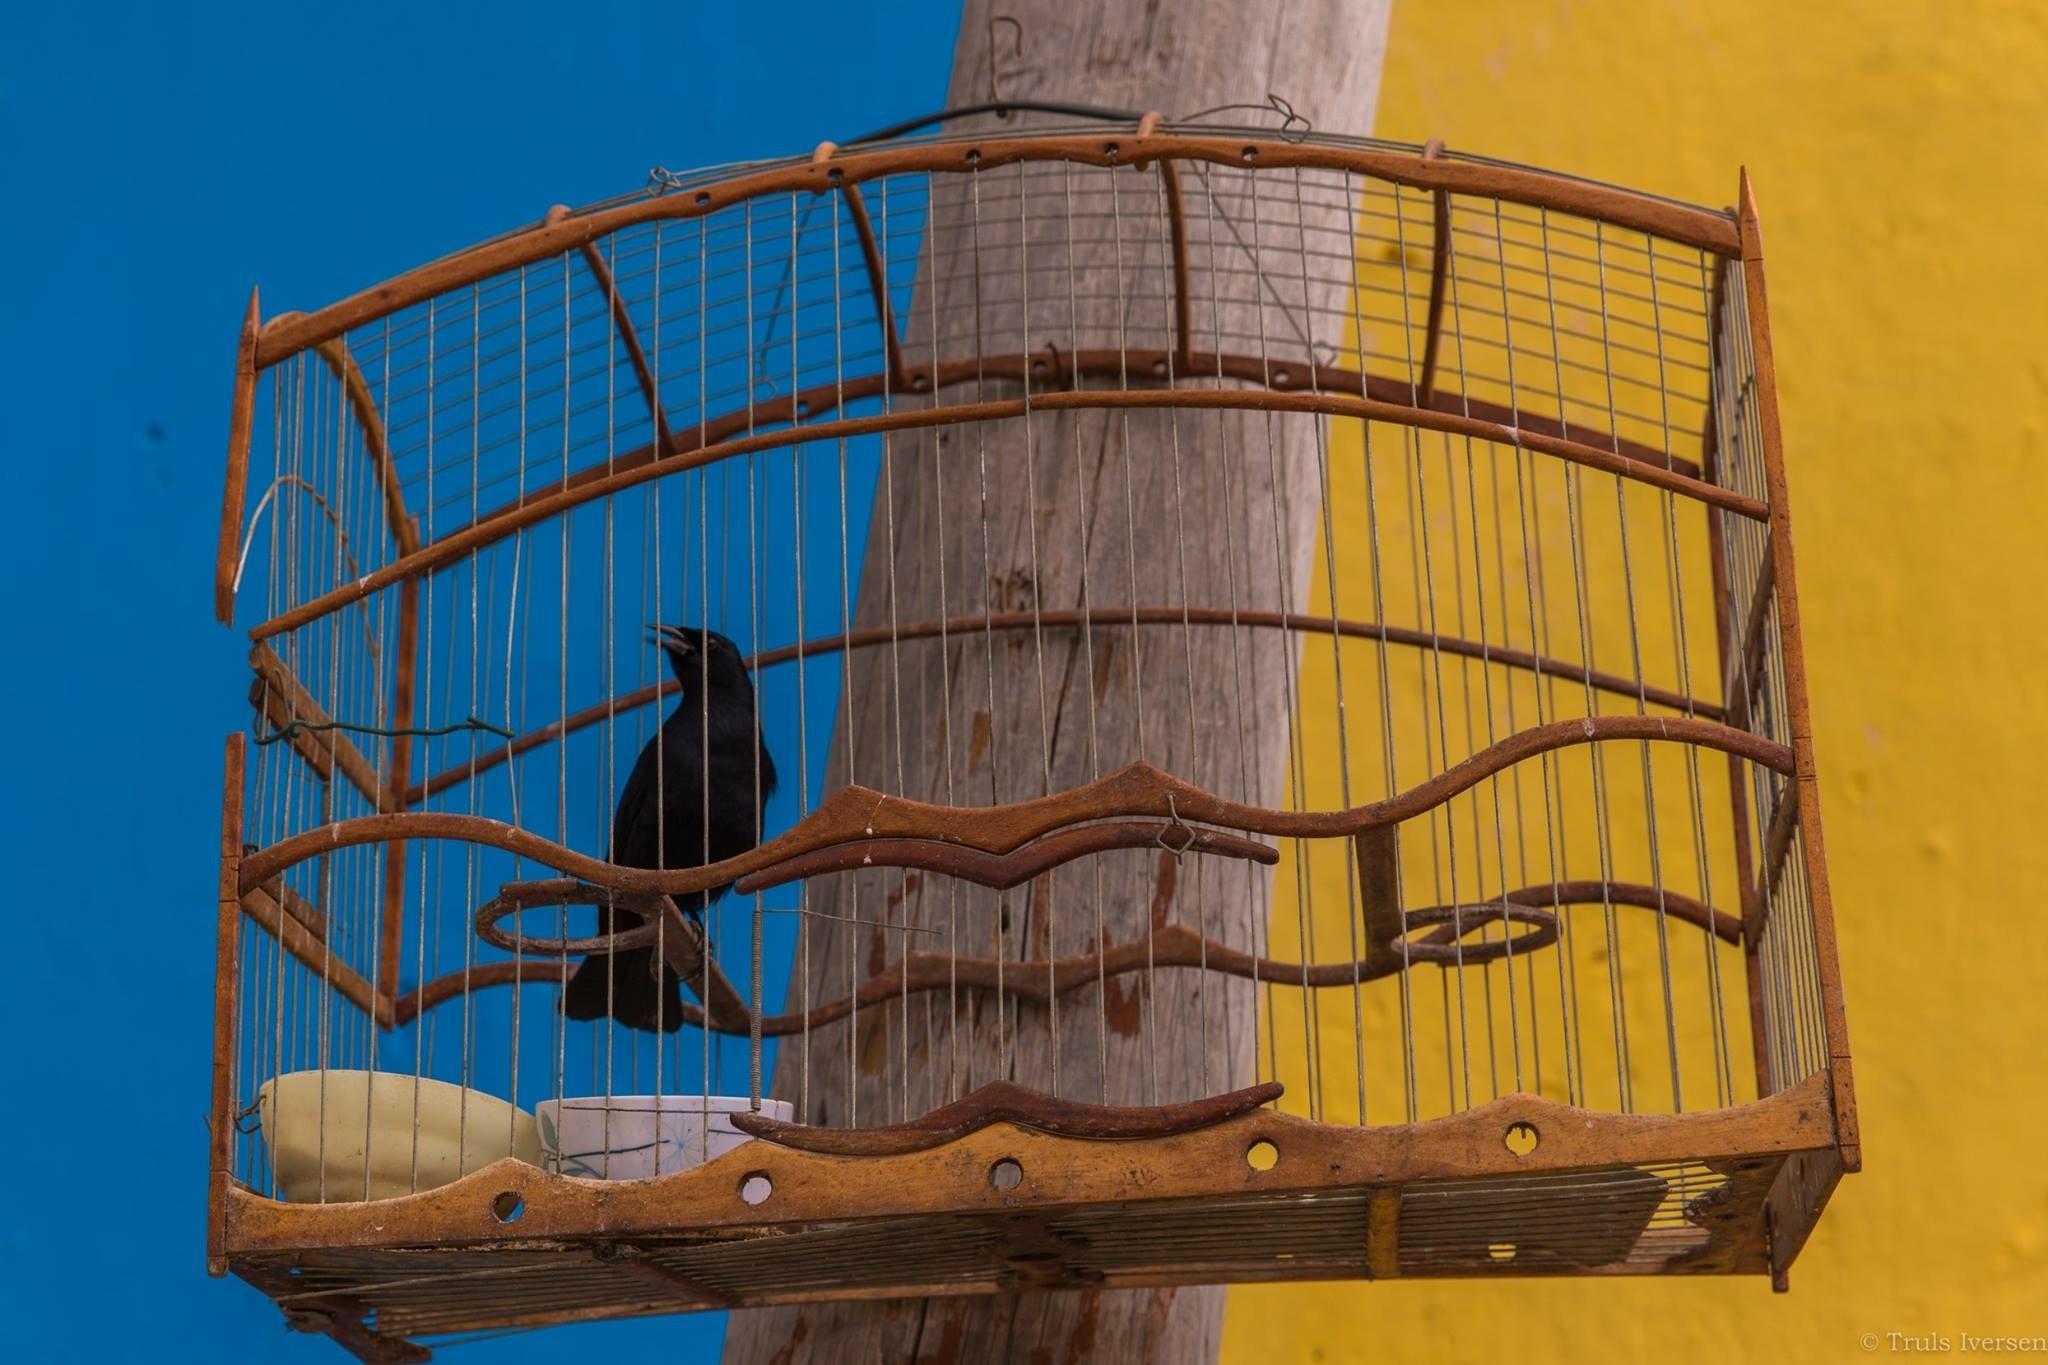 Neighbors share the bird by Truls Iversen